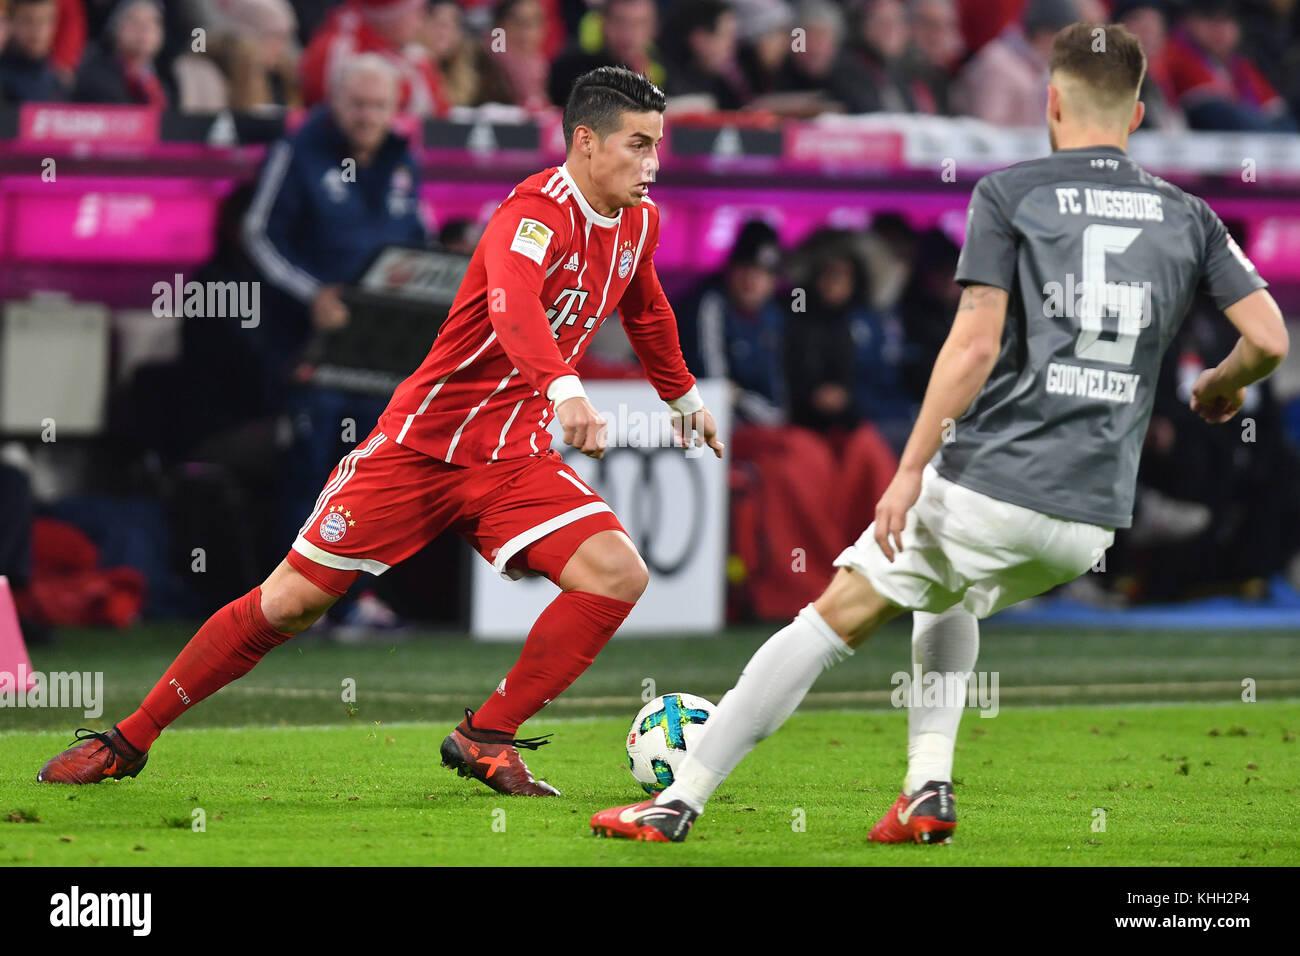 James RODRIGUEZ (FC Bayern Munich), Aktion, duels versus Jeffrey GOUWELEEUW (Augsburg). Fussball 1. Bundesliga, - Stock Image